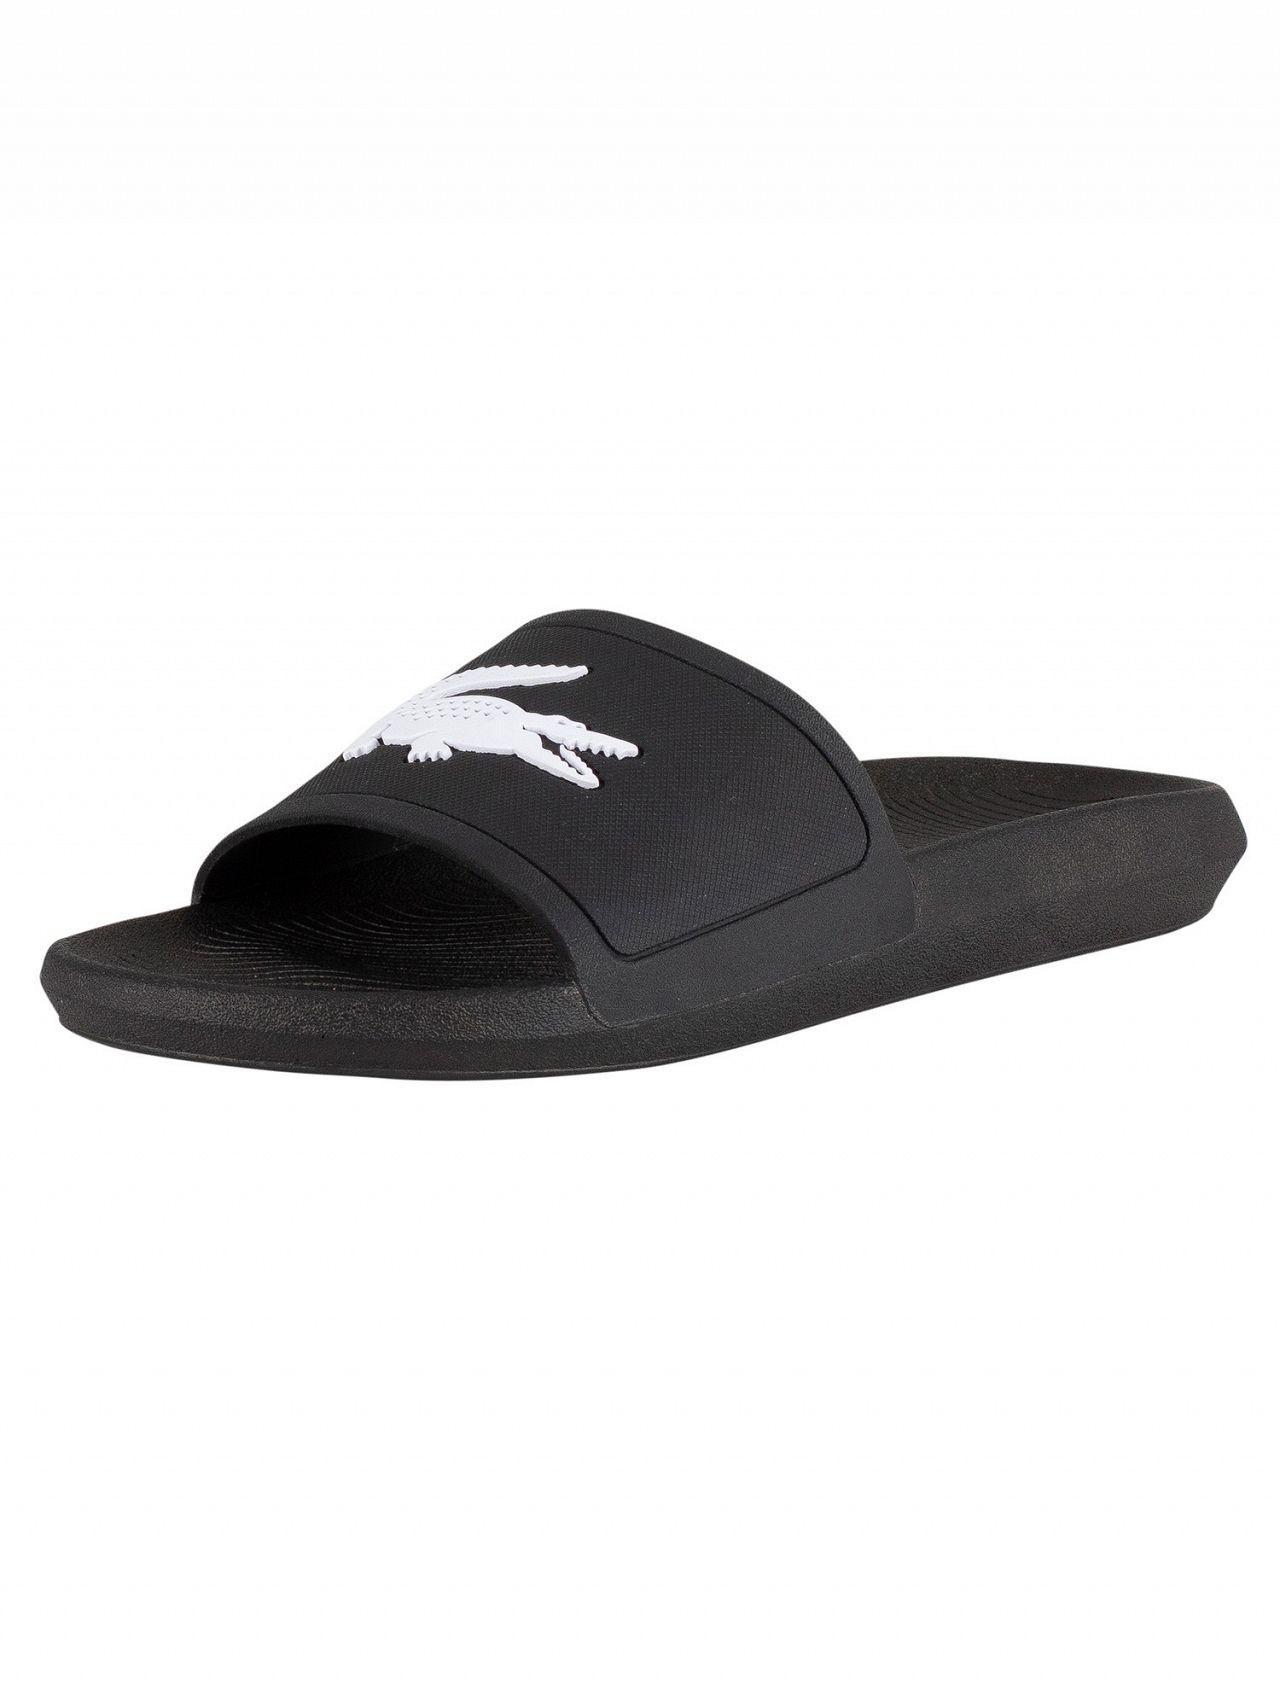 b4a68d9fea0cf Lacoste Black white Croco 119 1 Cma Sliders in Black for Men - Lyst